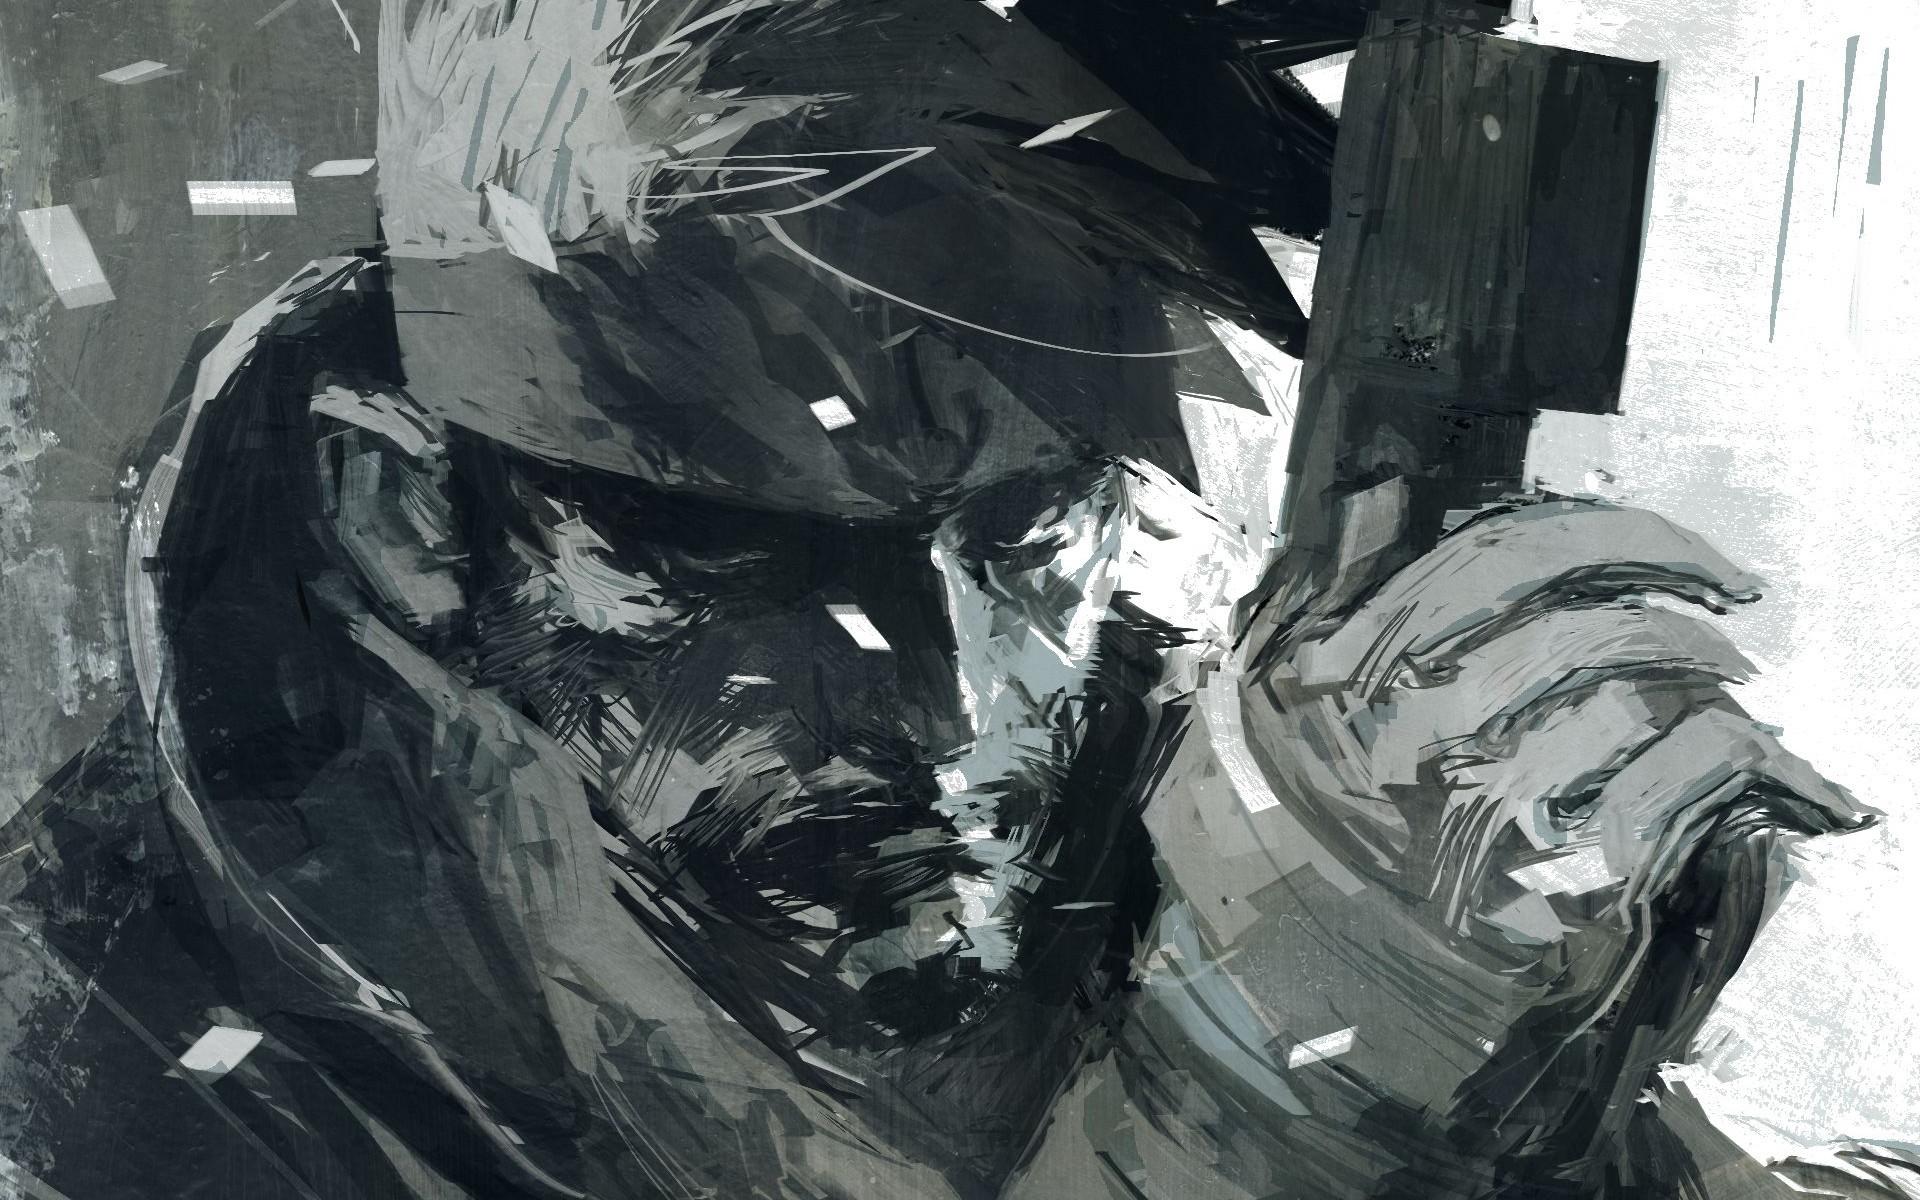 Metal Gear Solid 2 Wallpaper: Metal Gear Solid 2 Wallpaper